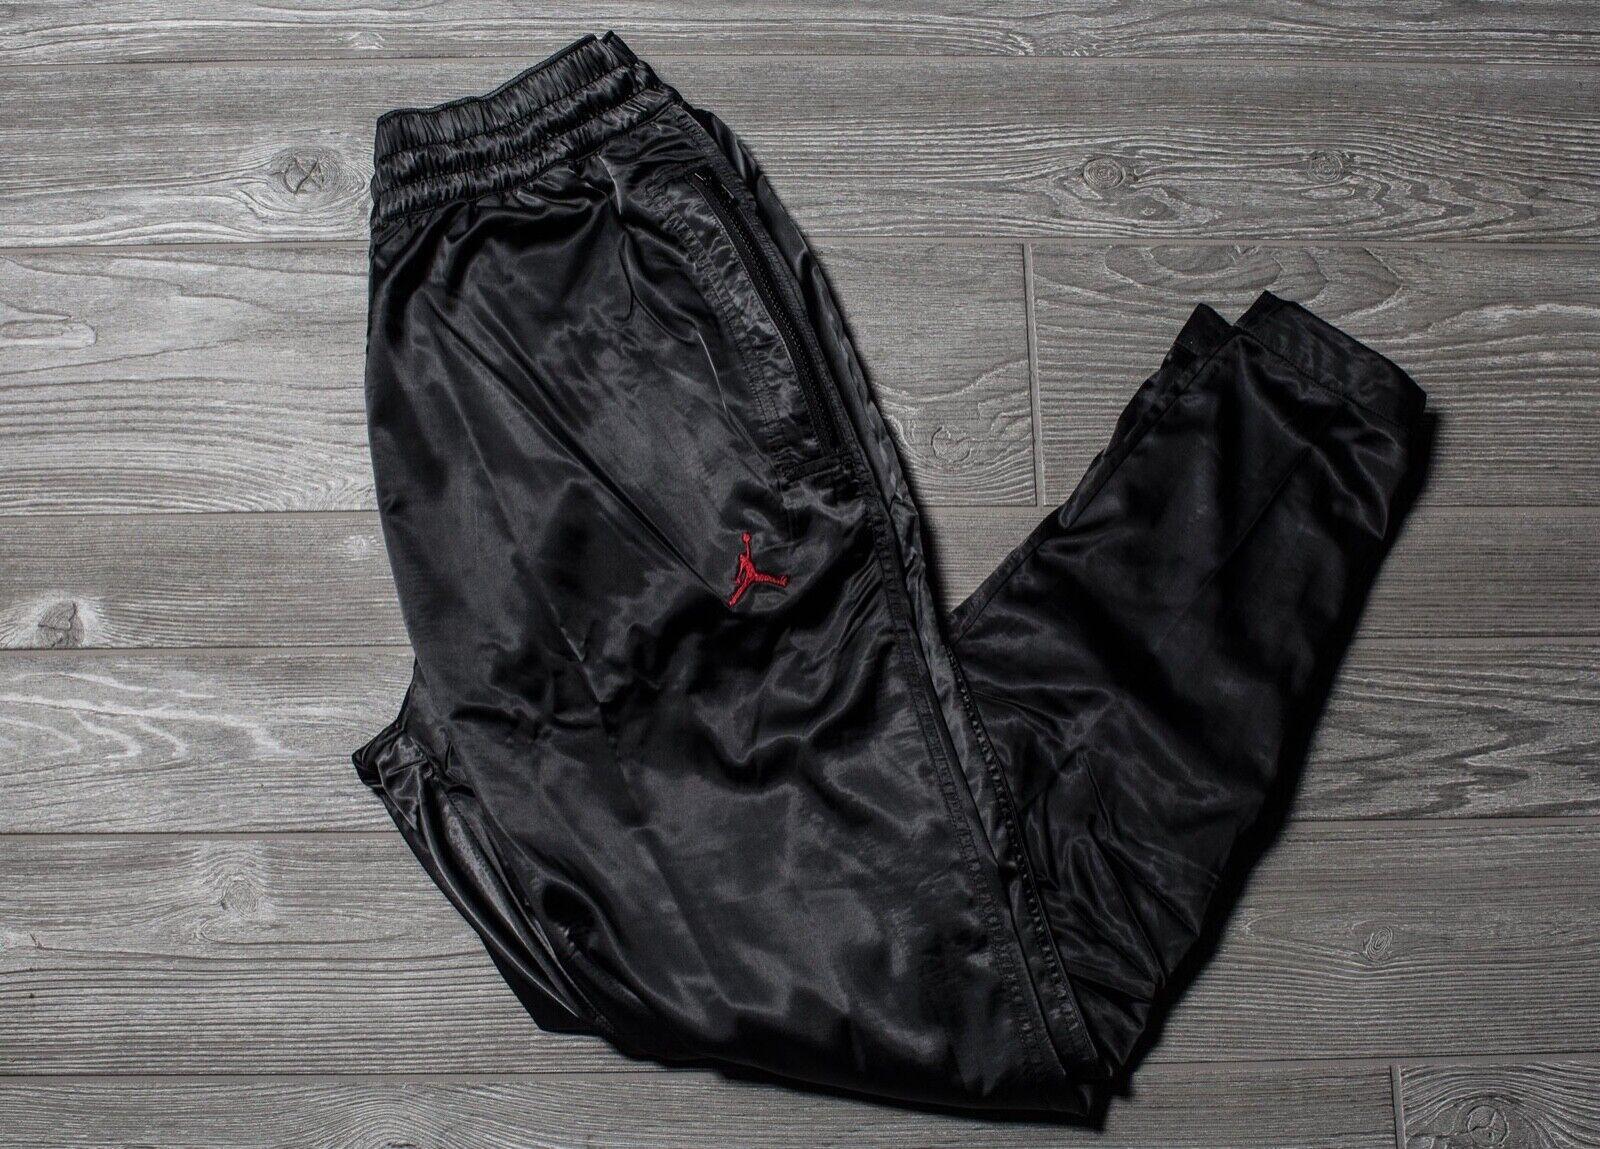 Men's Air Jordan Sports Wear AJ5 Satin Sweat Pants Athletic Fashion AR3137 010